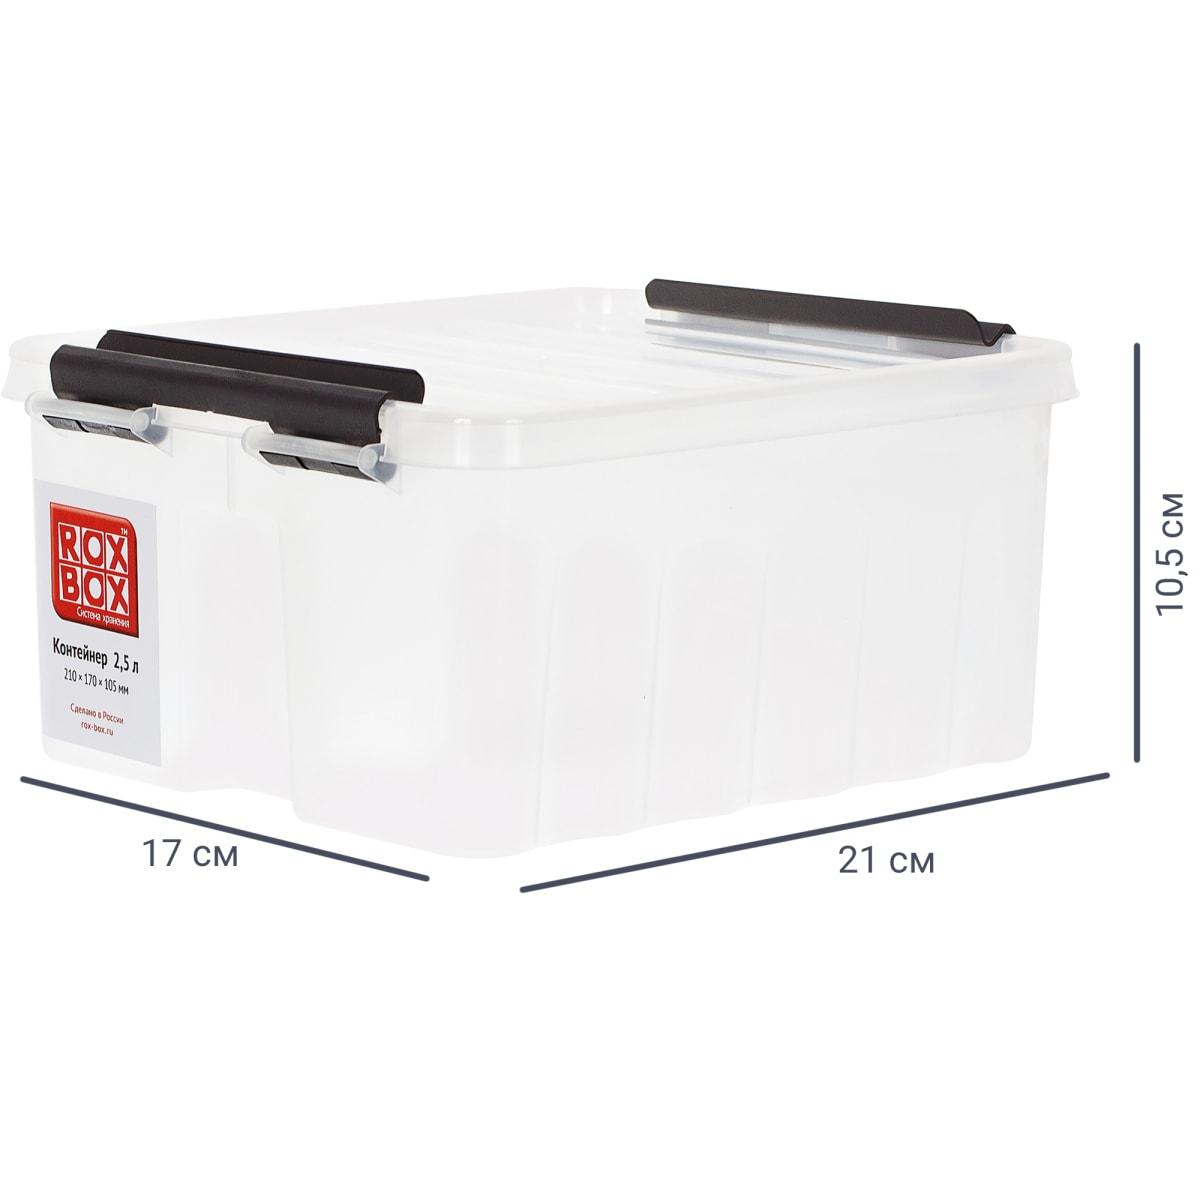 Контейнер Rox Box с крышкой 17x10.5x21 см, 2.5 л, пластик цвет прозрачный